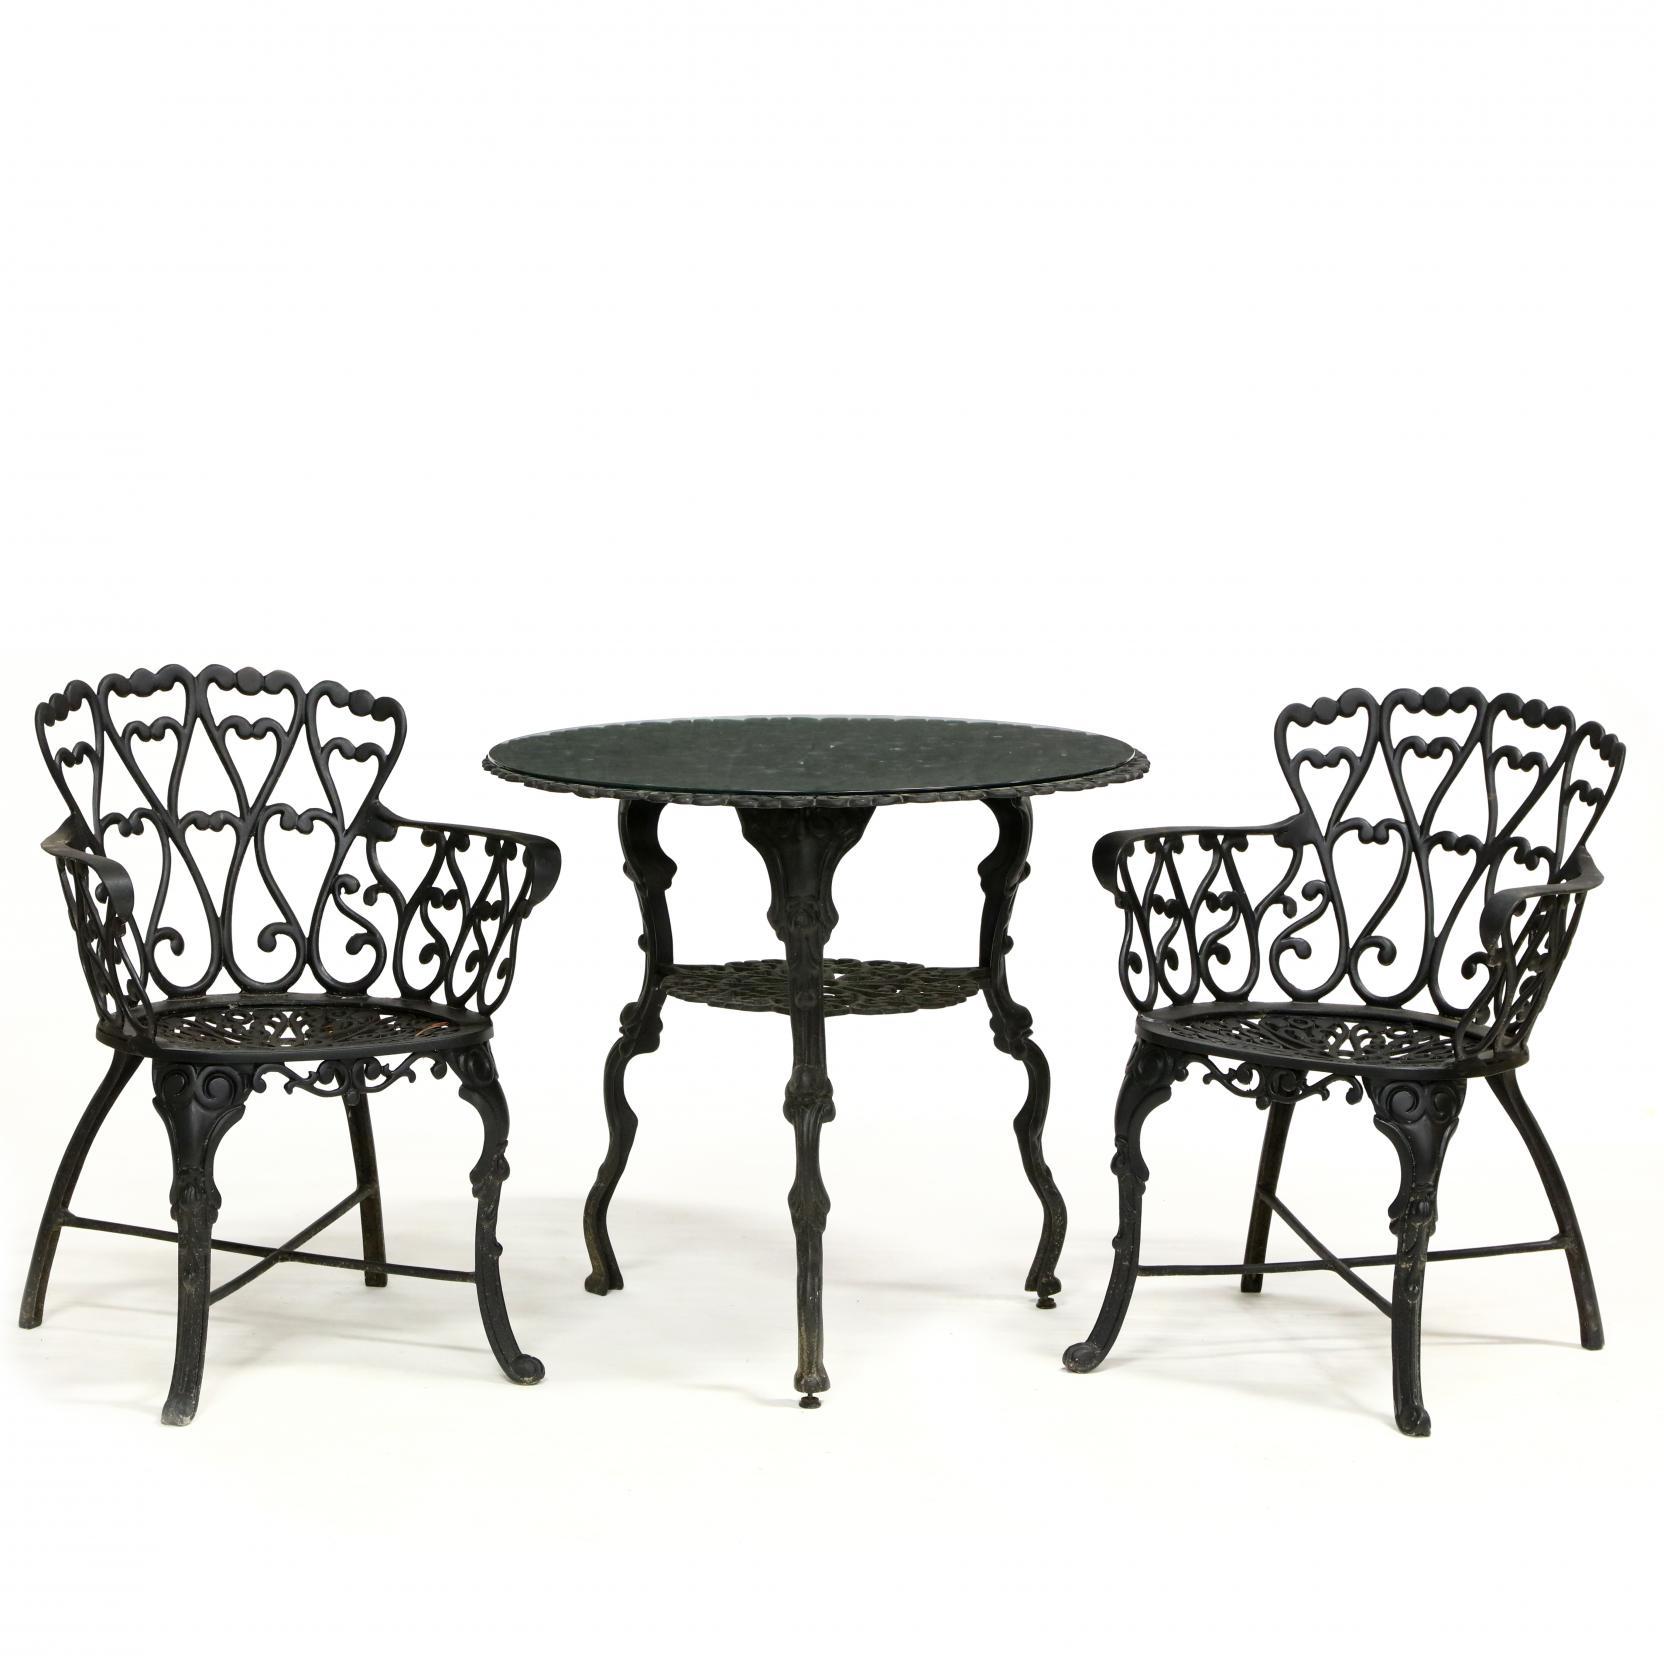 three-piece-cast-aluminum-garden-set